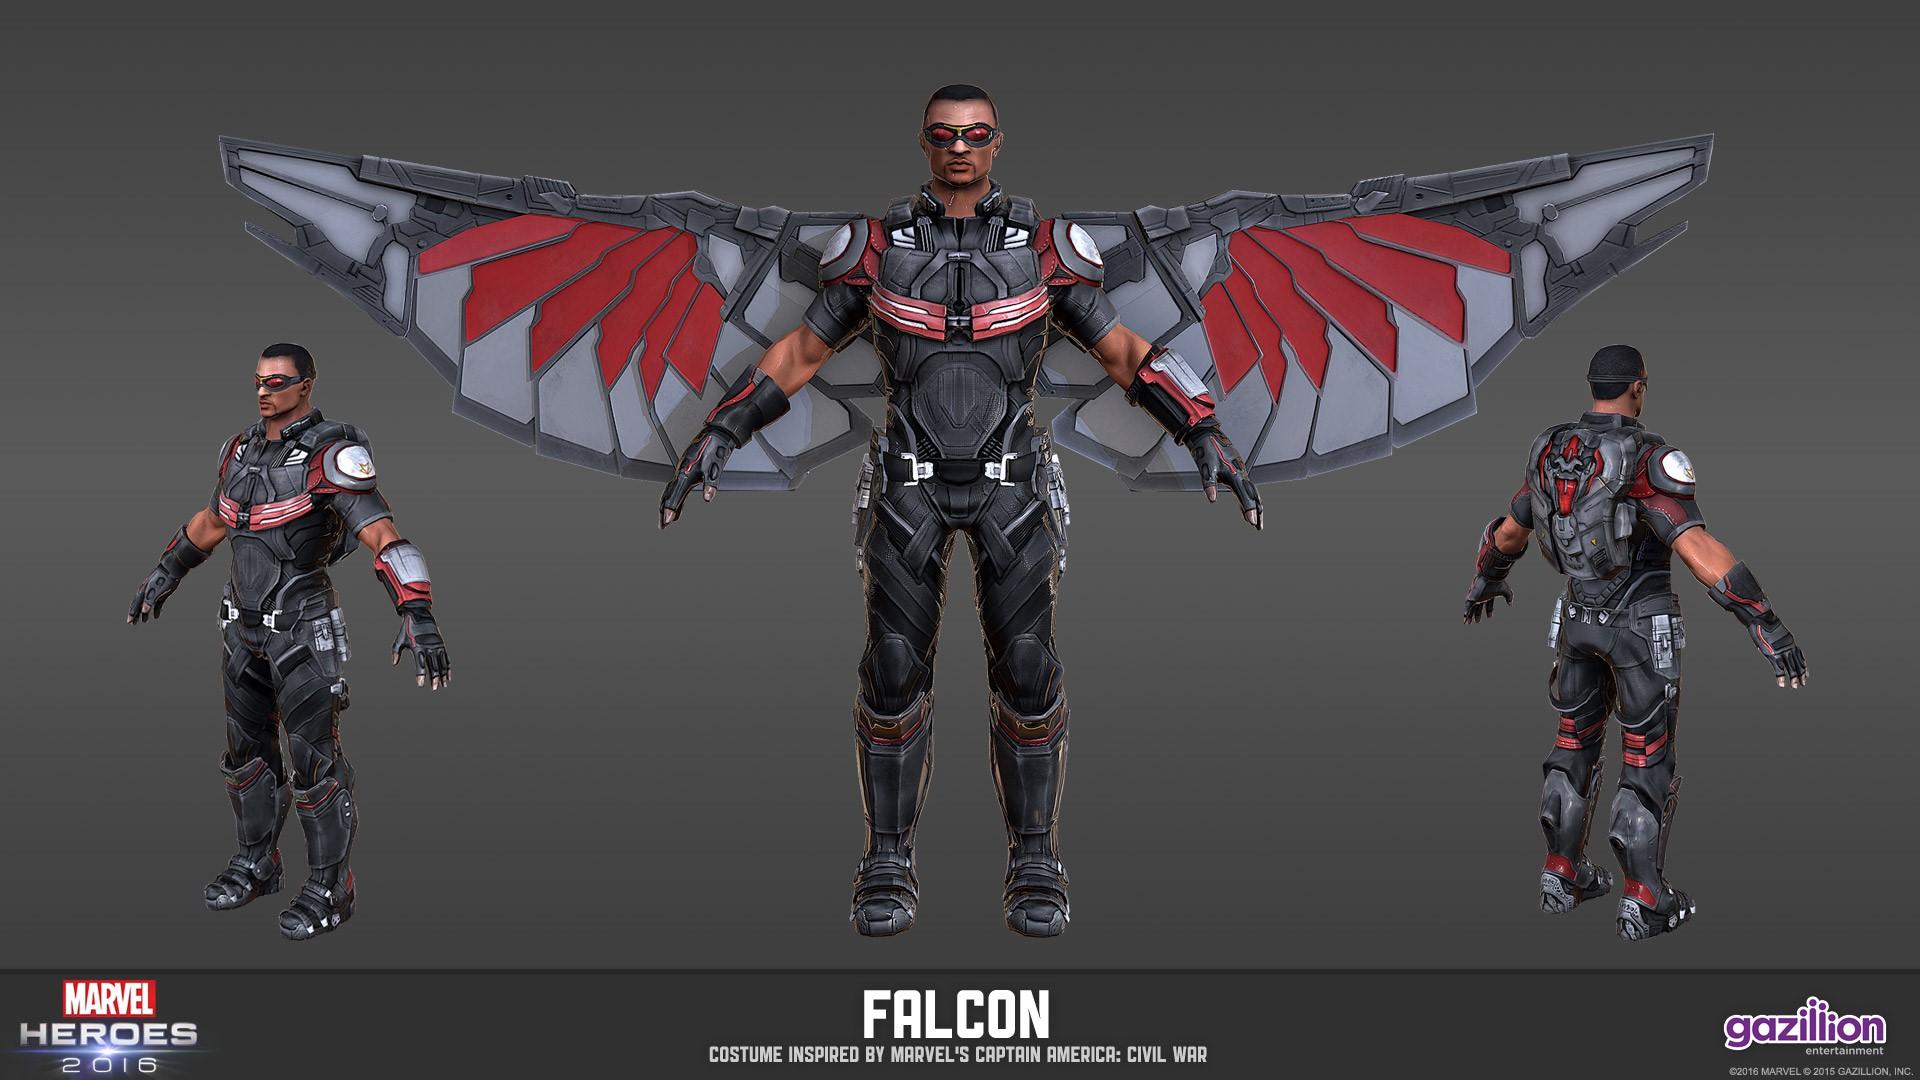 Fantastic Wallpaper Marvel Falcon - latest?cb\u003d20170929024347  Pic_315599.jpg/revision/latest?cb\u003d20170929024347